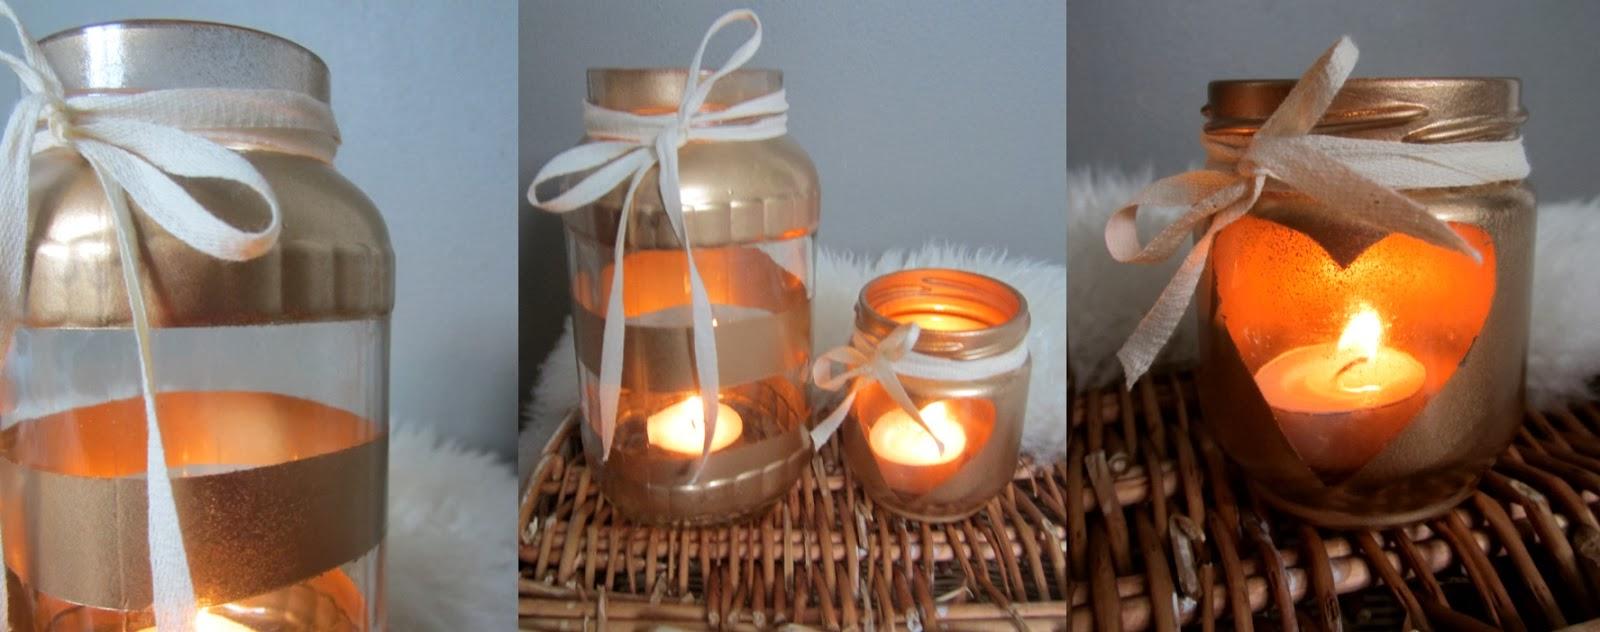 DIY: Mason Jar Candle Holders - Rach Speed